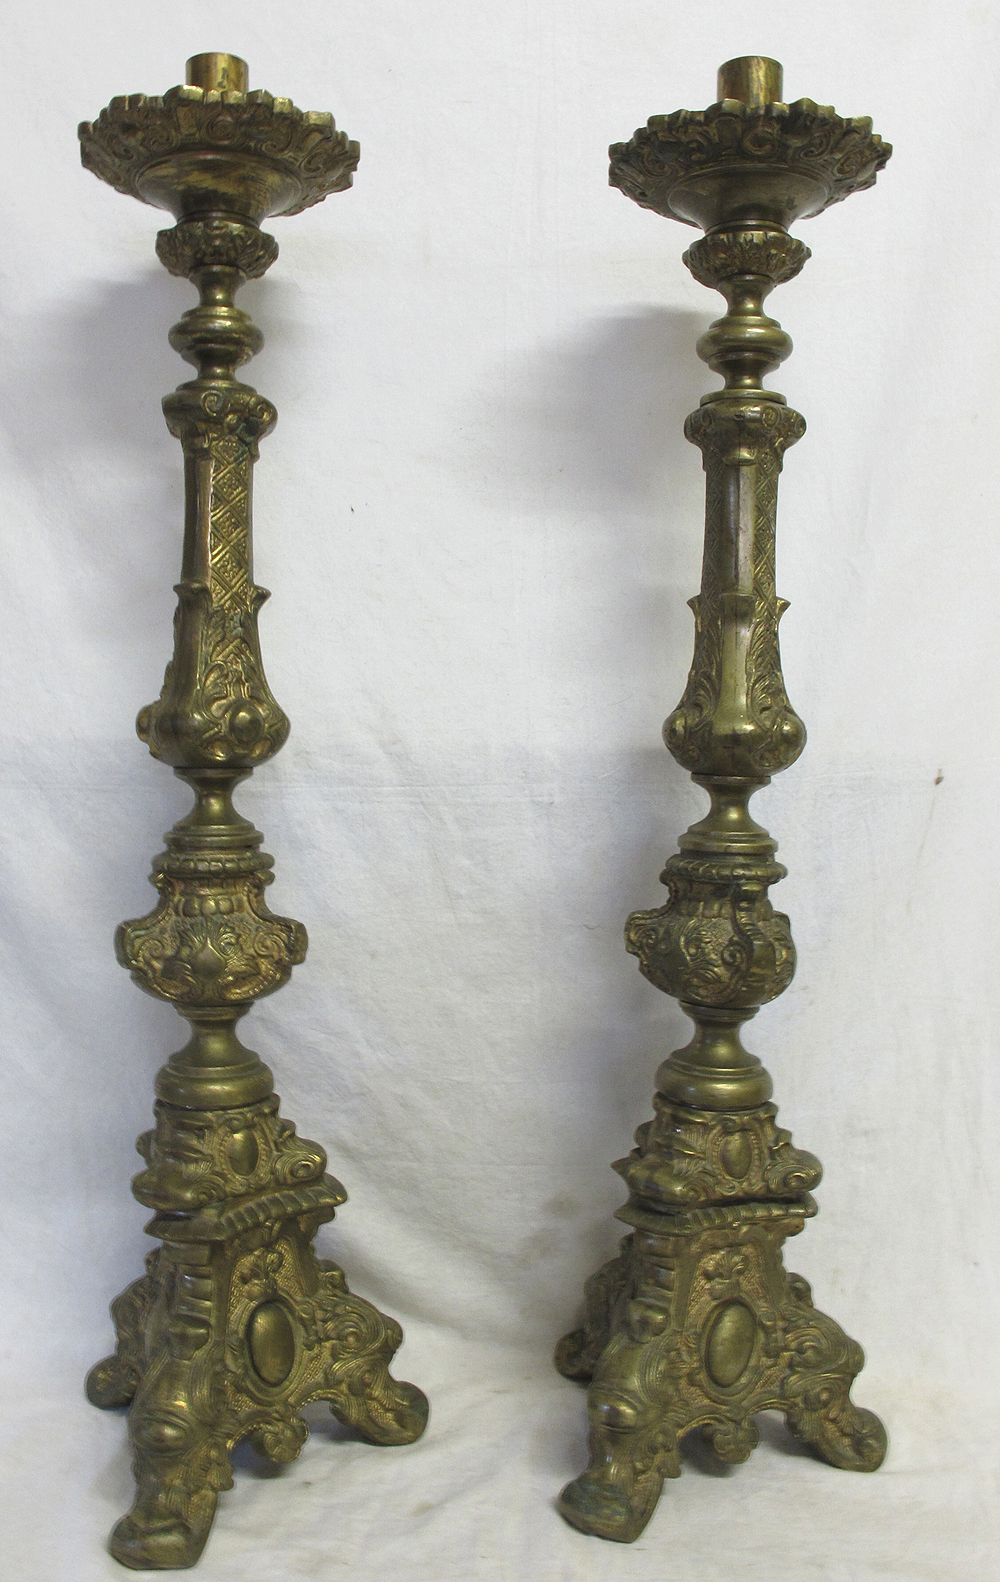 2 Antique 32 Ornate Gilt Brass Church Floor